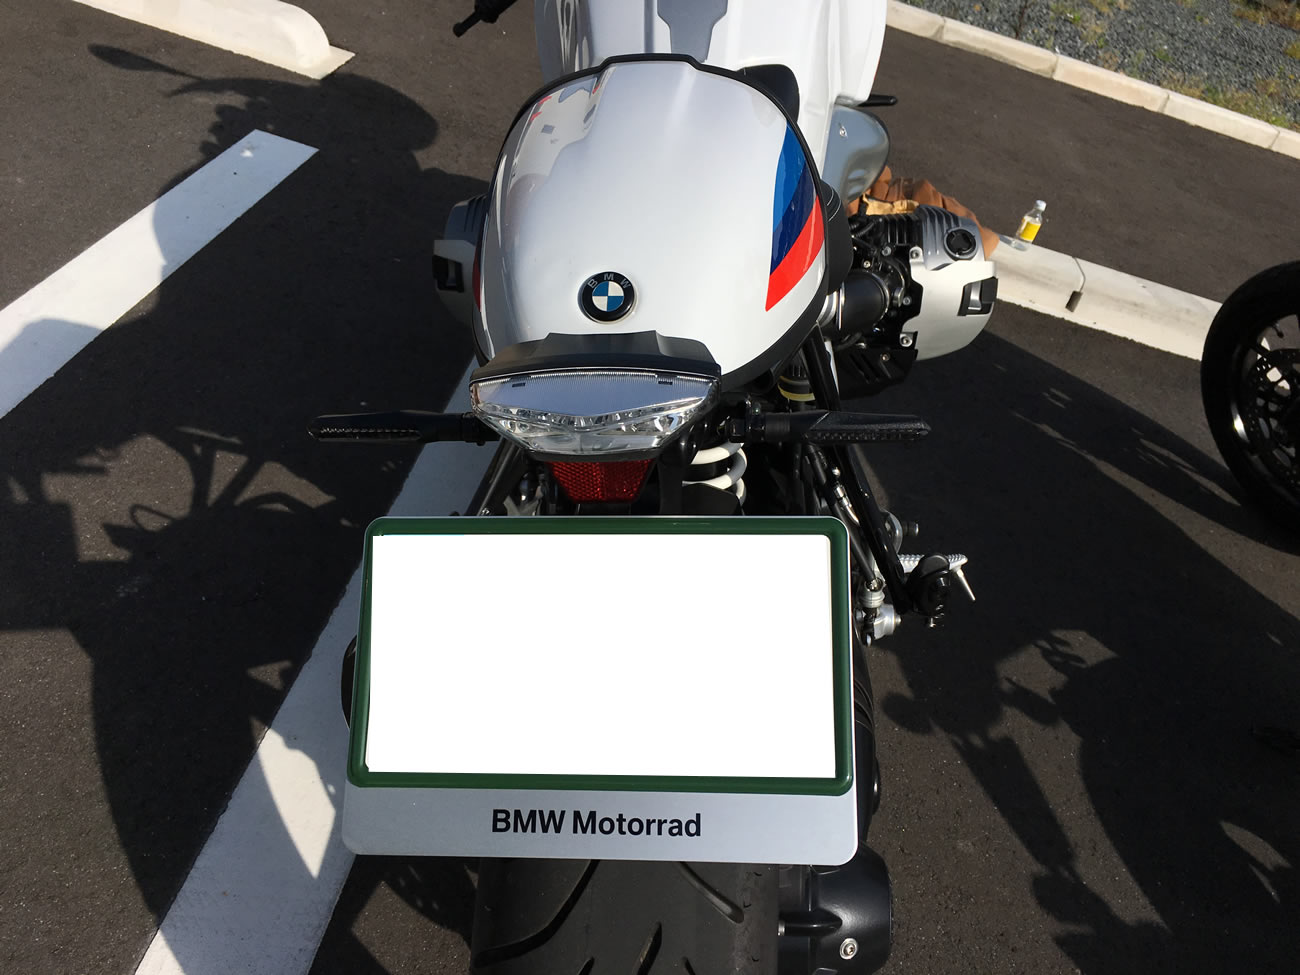 R nineT racer(BMW)のACTIVフェンダーレスキット